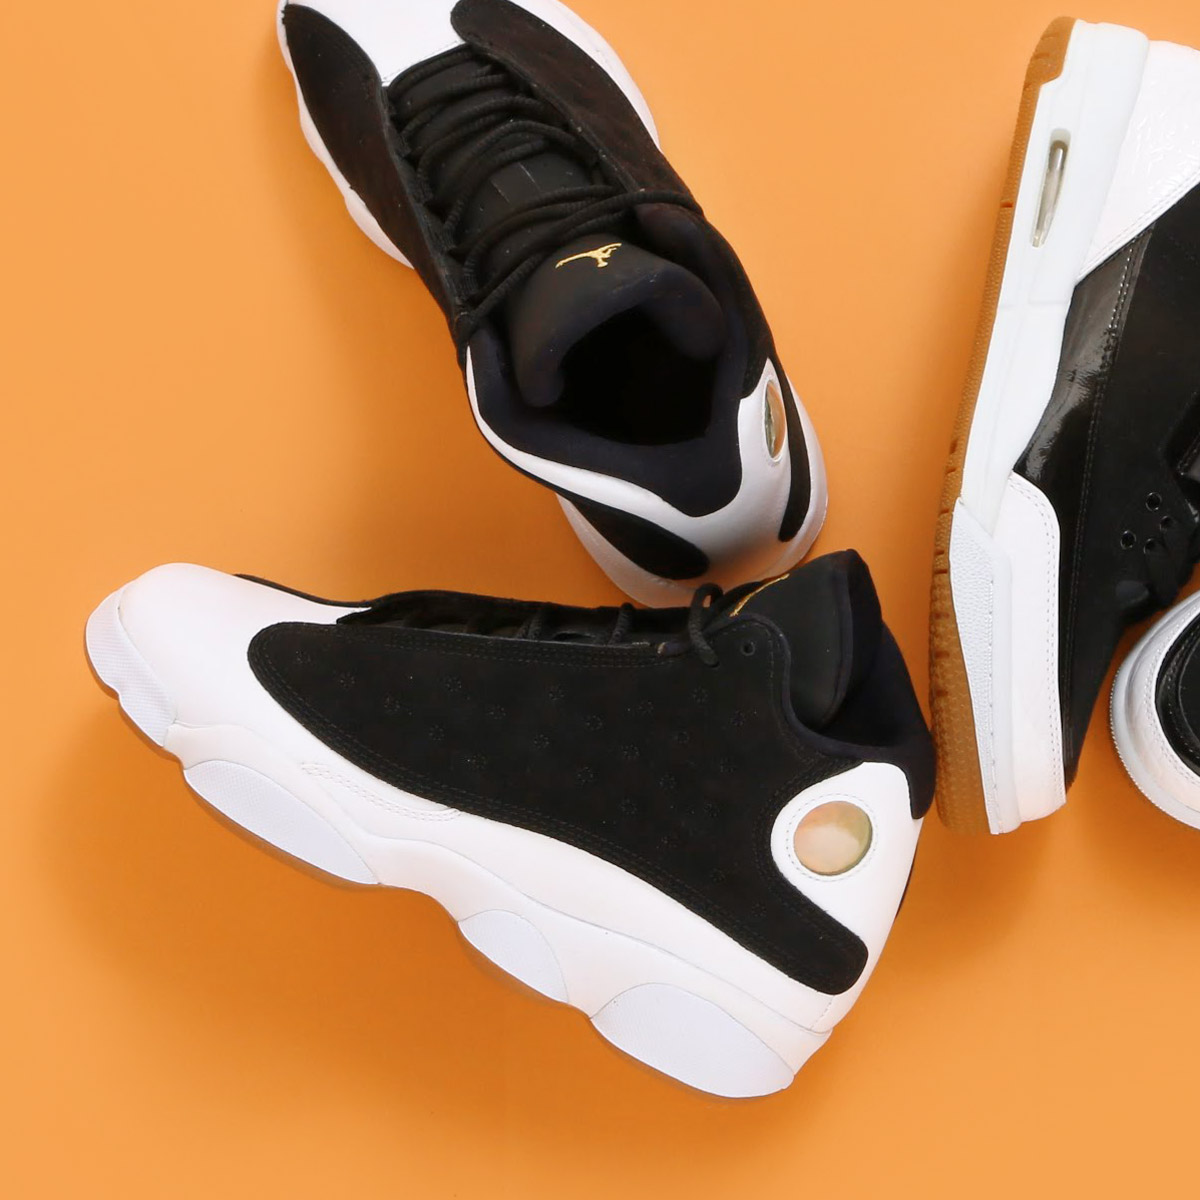 online store 23638 f8d8e Categories. « All Categories · Kids, Baby   Maternity · Kids · Shoes ·  Sneakers · NIKE AIR JORDAN RETRO 13 GG ...